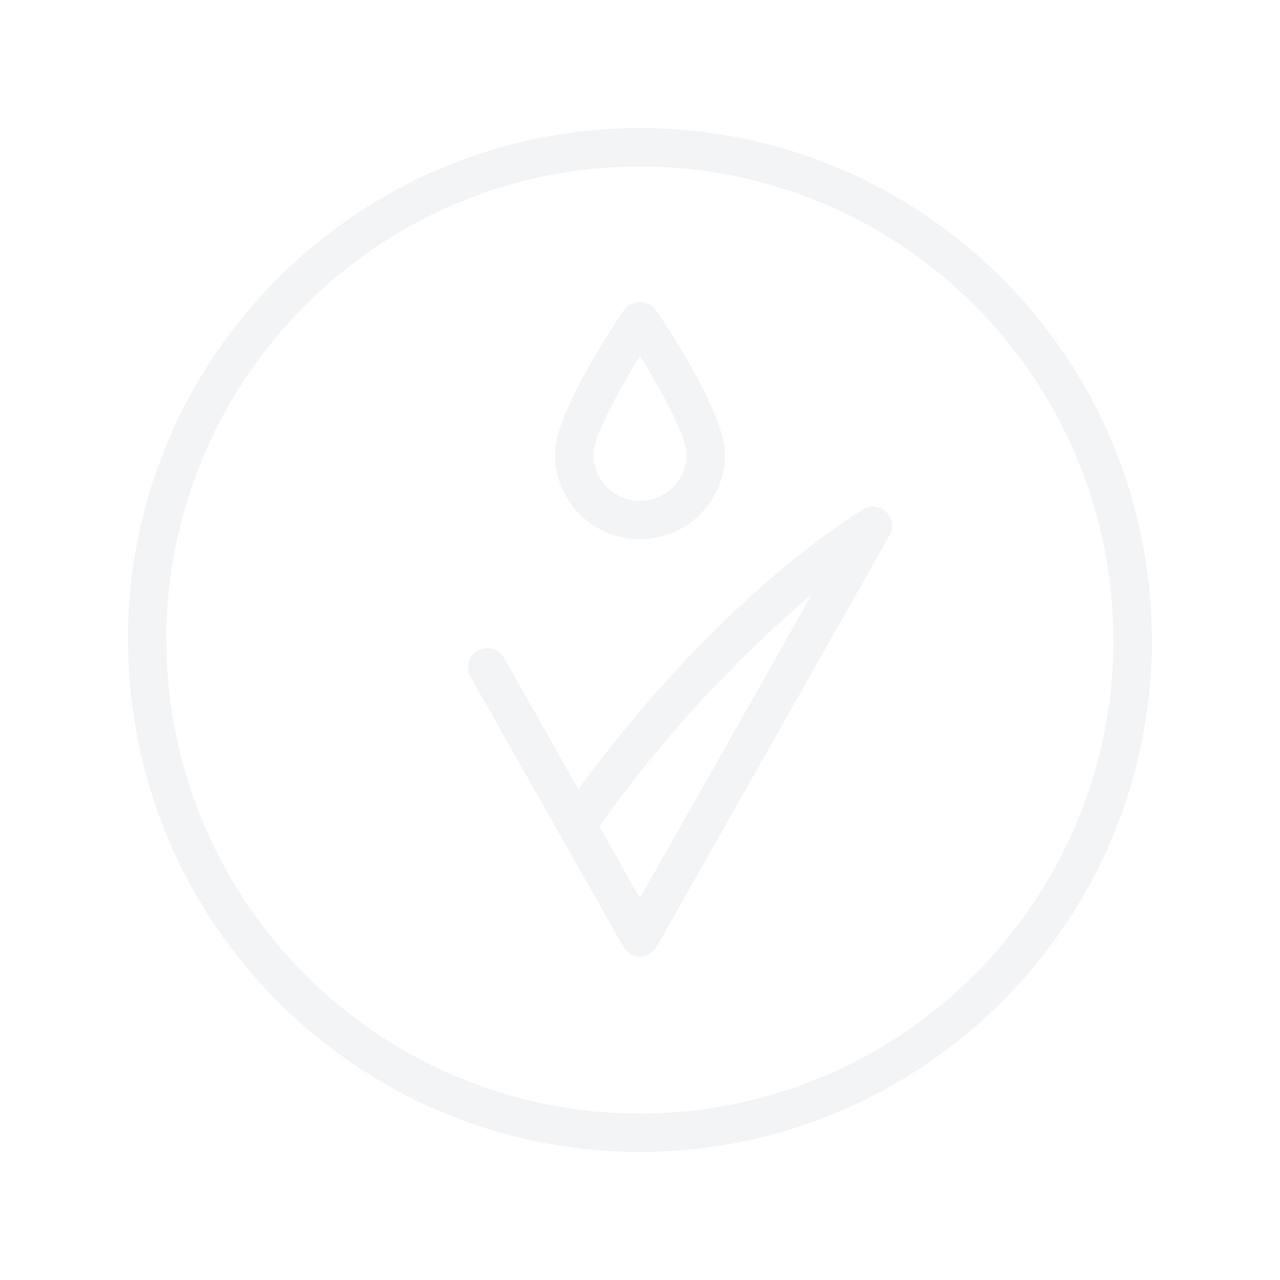 Maybelline The Colossal Waterproof Mascara Glam Black 10ml